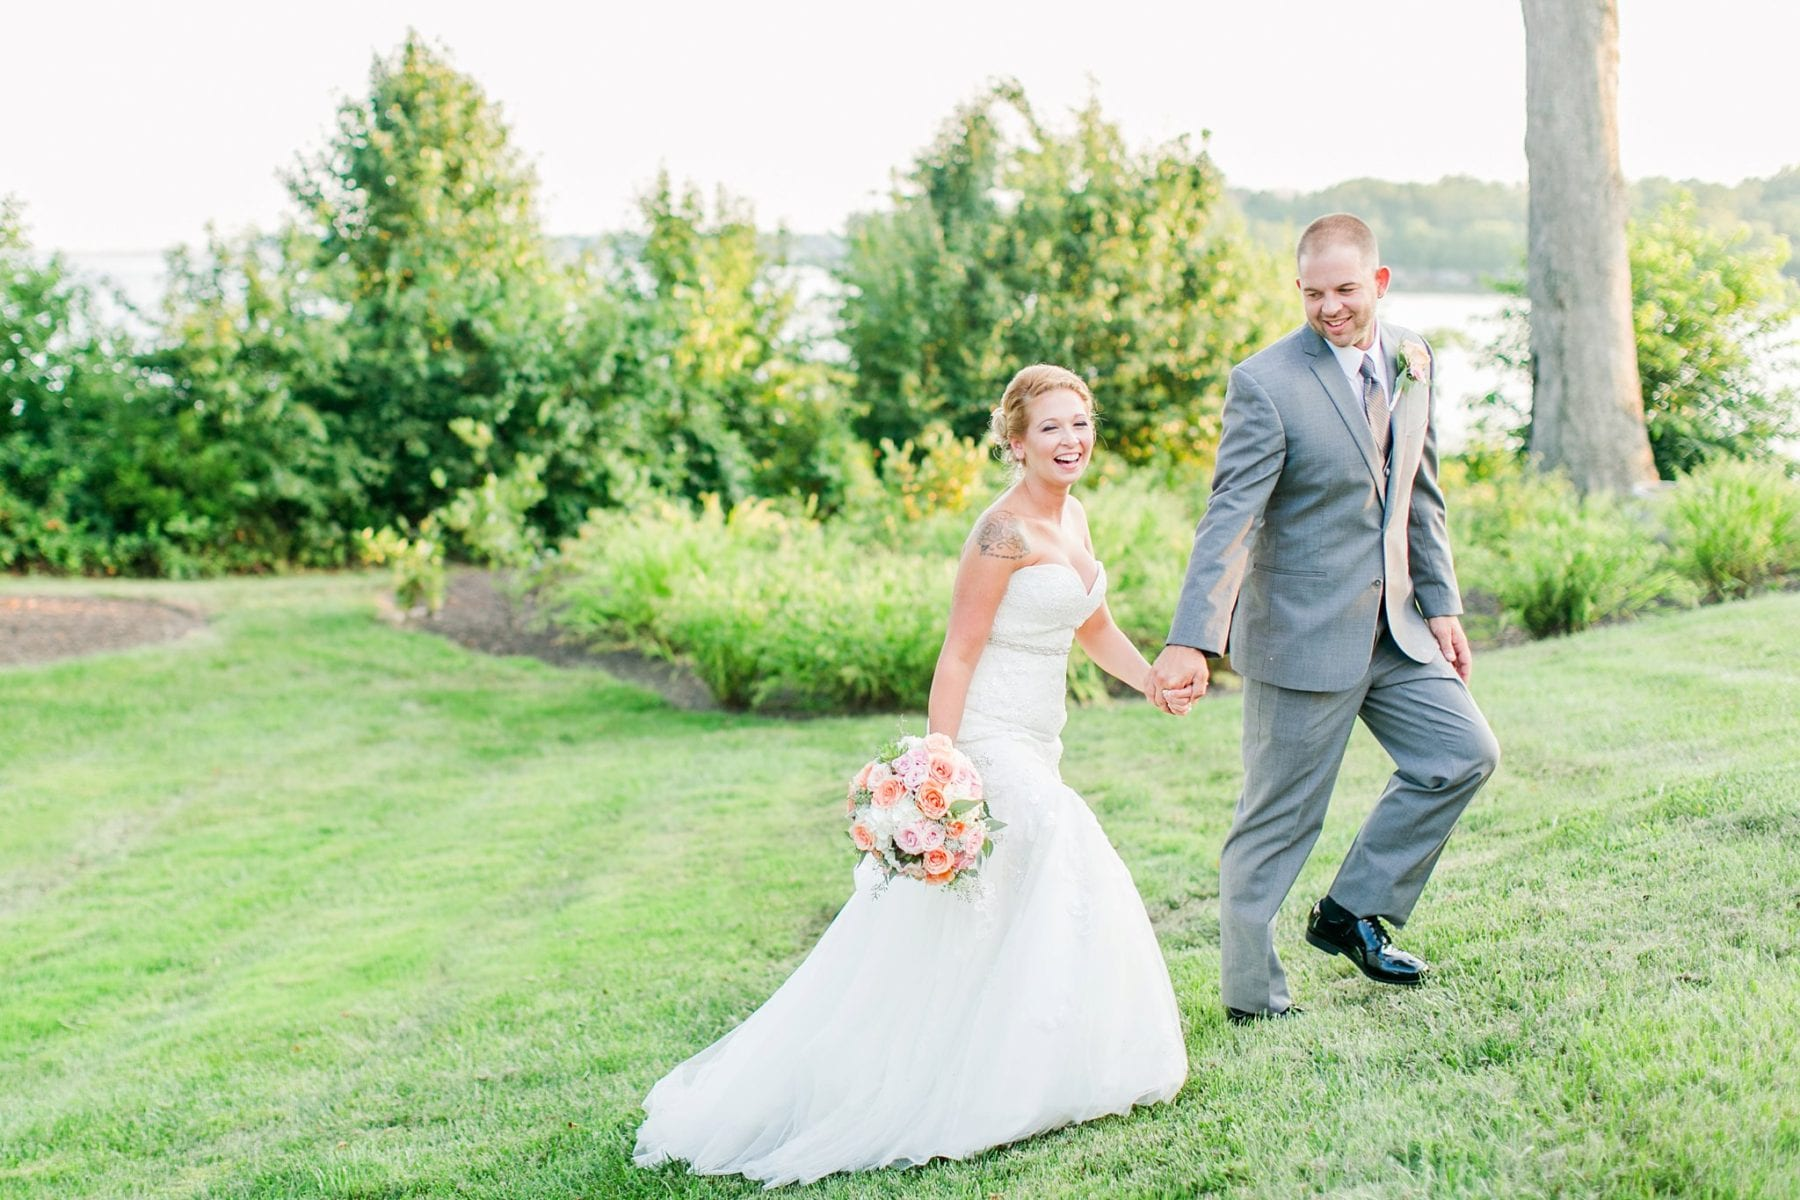 Waters Edge Wedding Photos Maryland Wedding Photographer Megan Kelsey Photography Katie & Conor-509.JPG